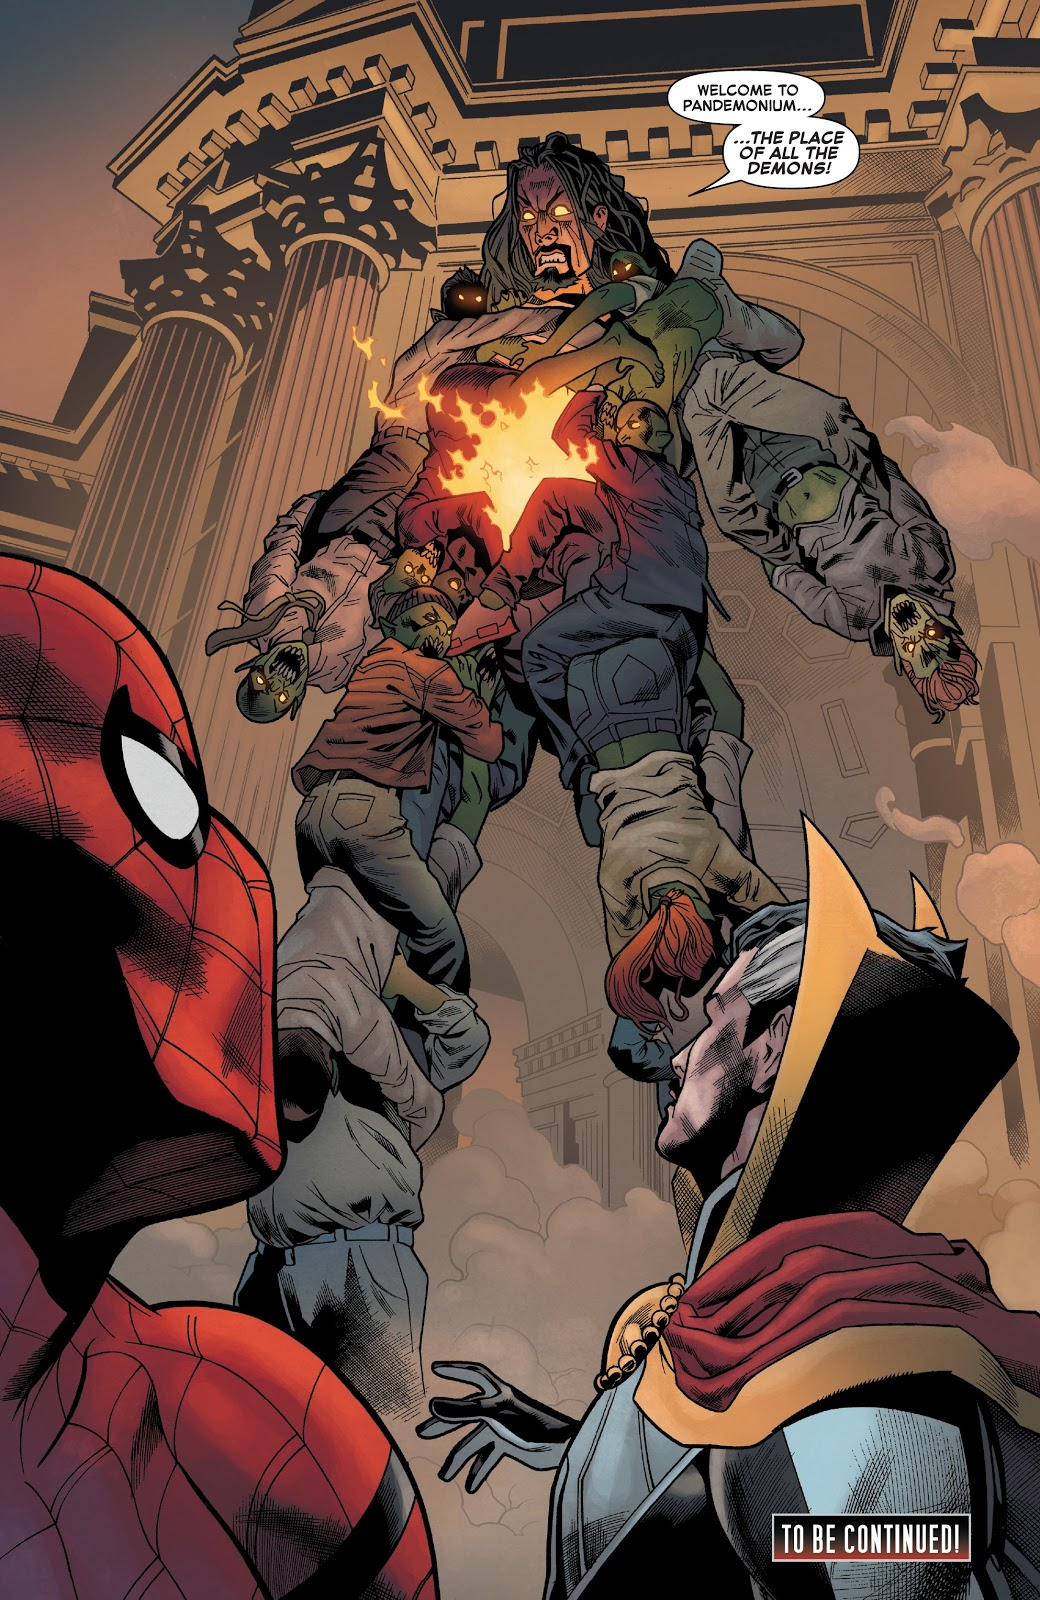 From – Superior Spider-Man Vol. 2 #5